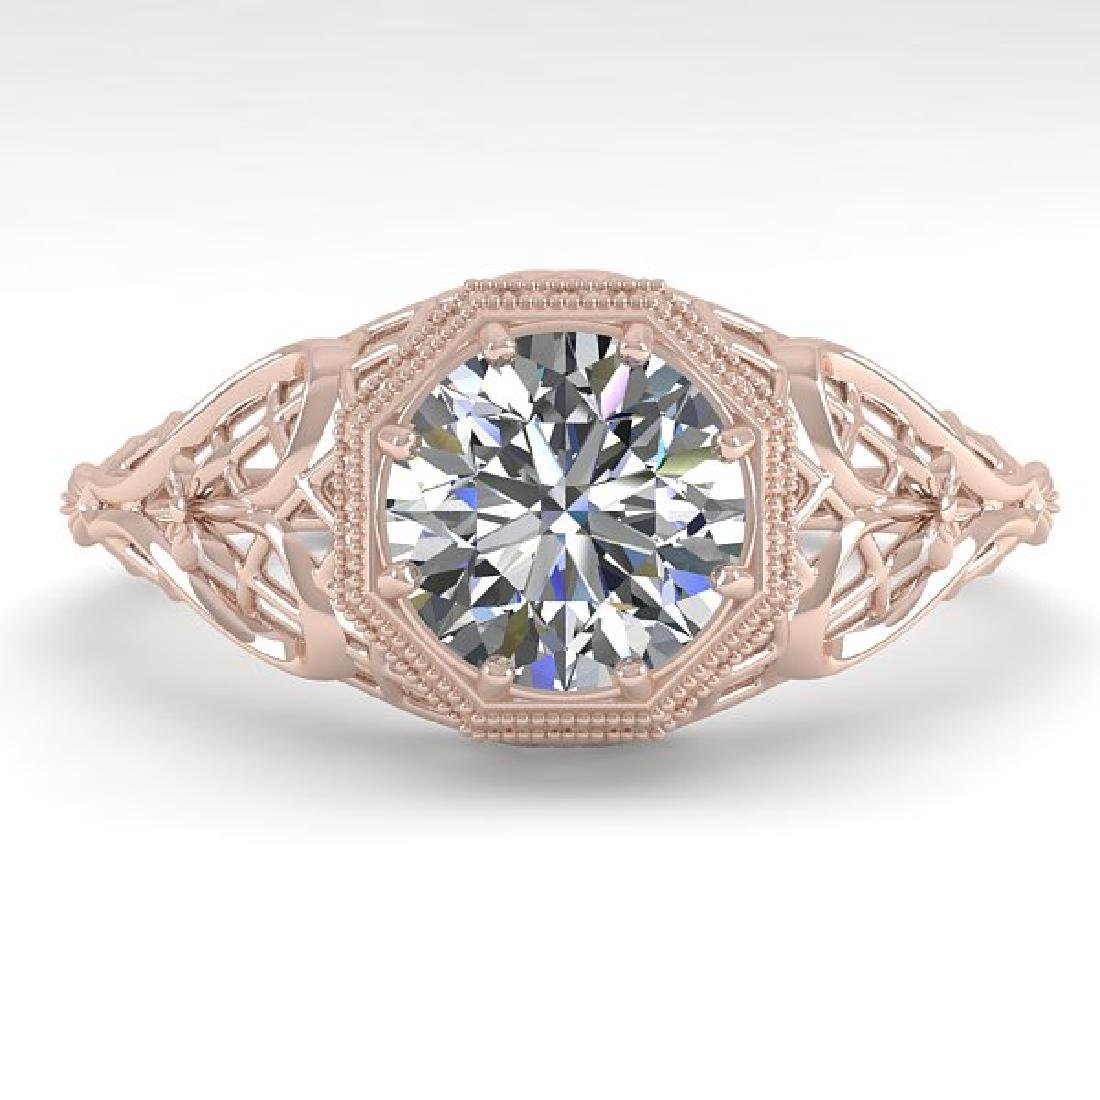 1.01 CTW VS/SI Diamond Solitaire Ring 14K Rose Gold